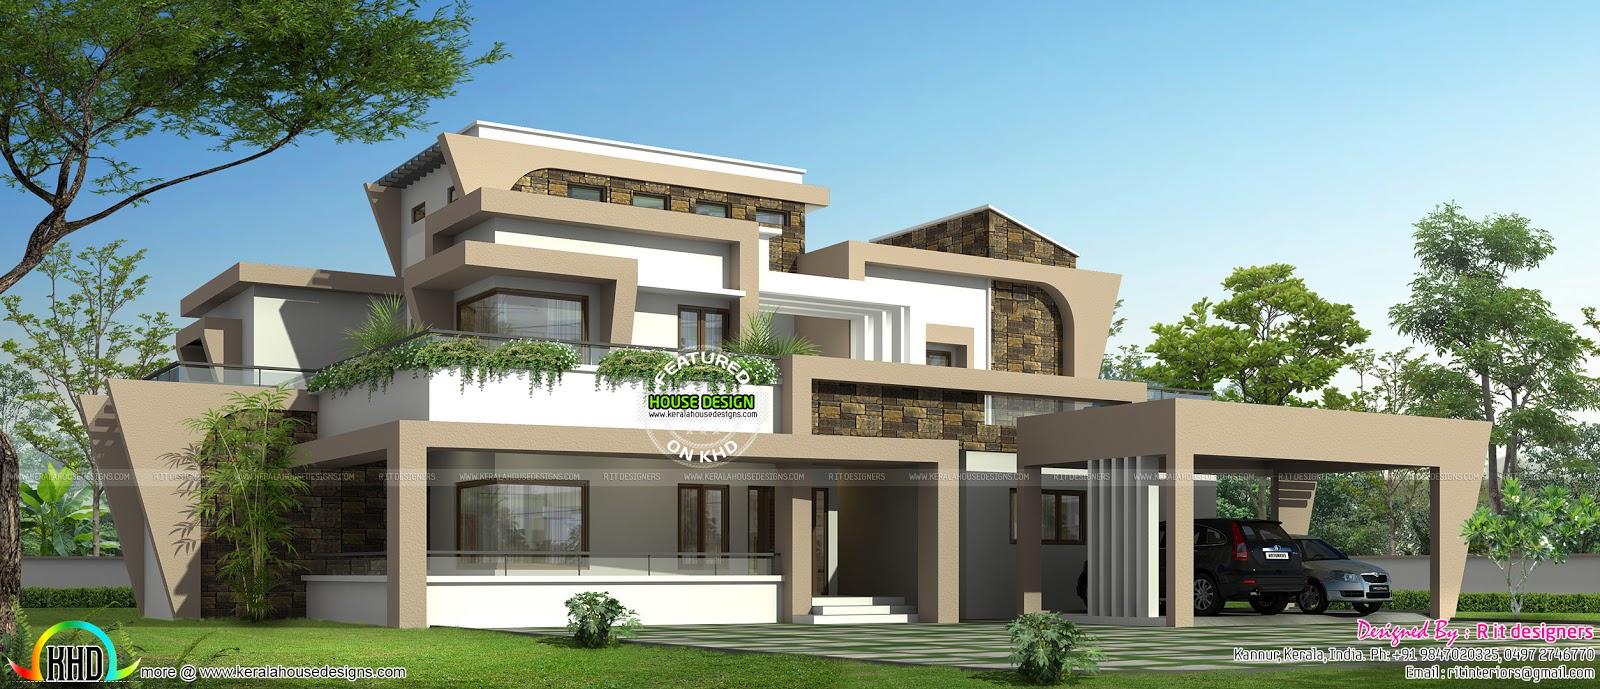 unique modern home design in kerala kerala home design and floor plans. Black Bedroom Furniture Sets. Home Design Ideas